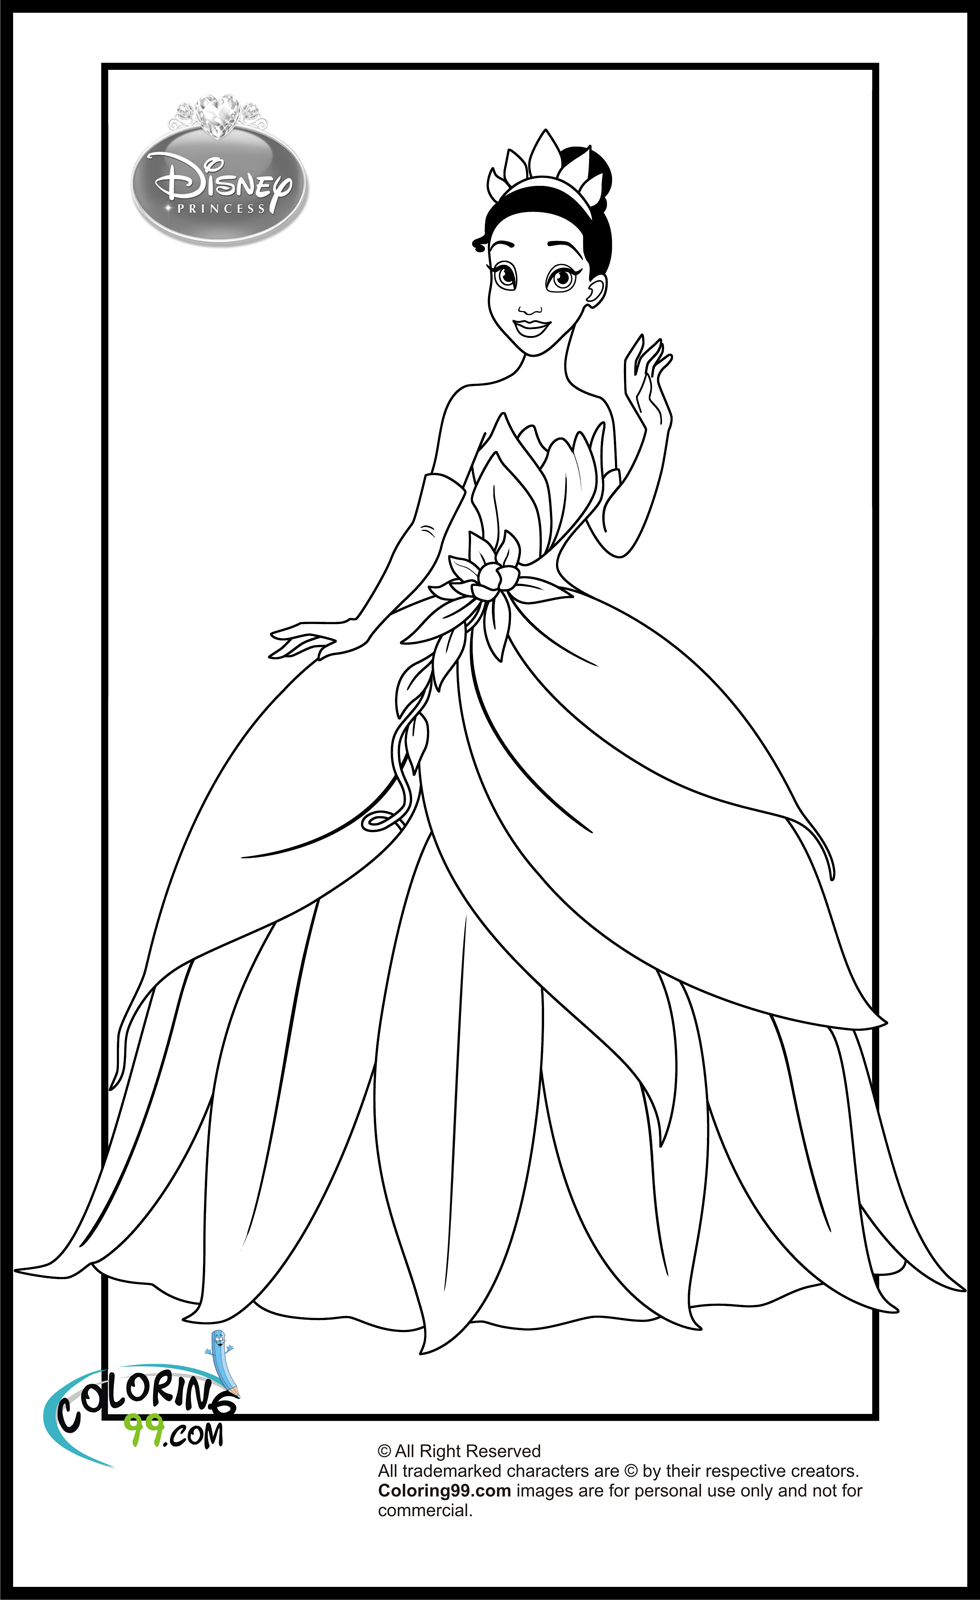 disney princess coloring sheets disney princess coloring pages free printable disney sheets coloring princess